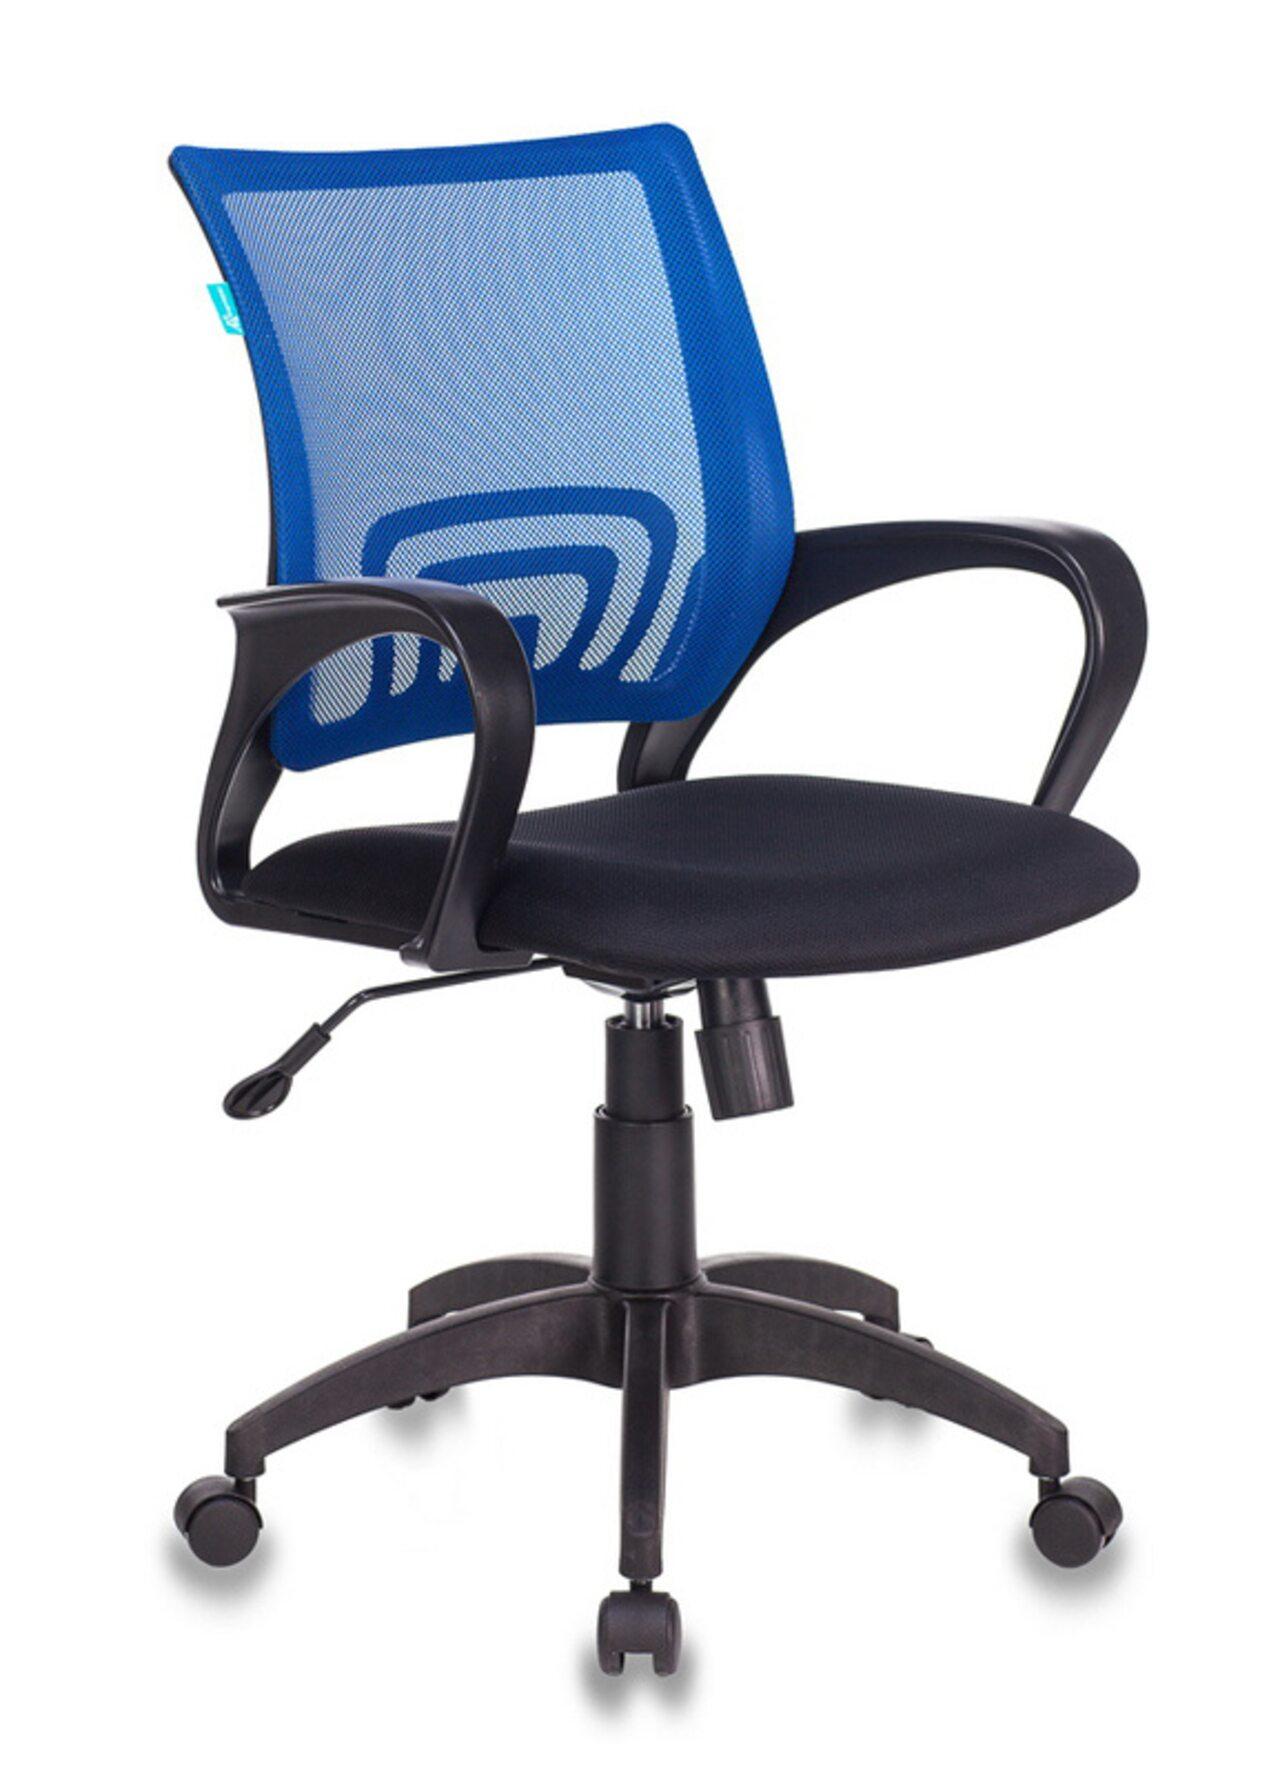 Кресло для персонала CH-695N/ - фото 1